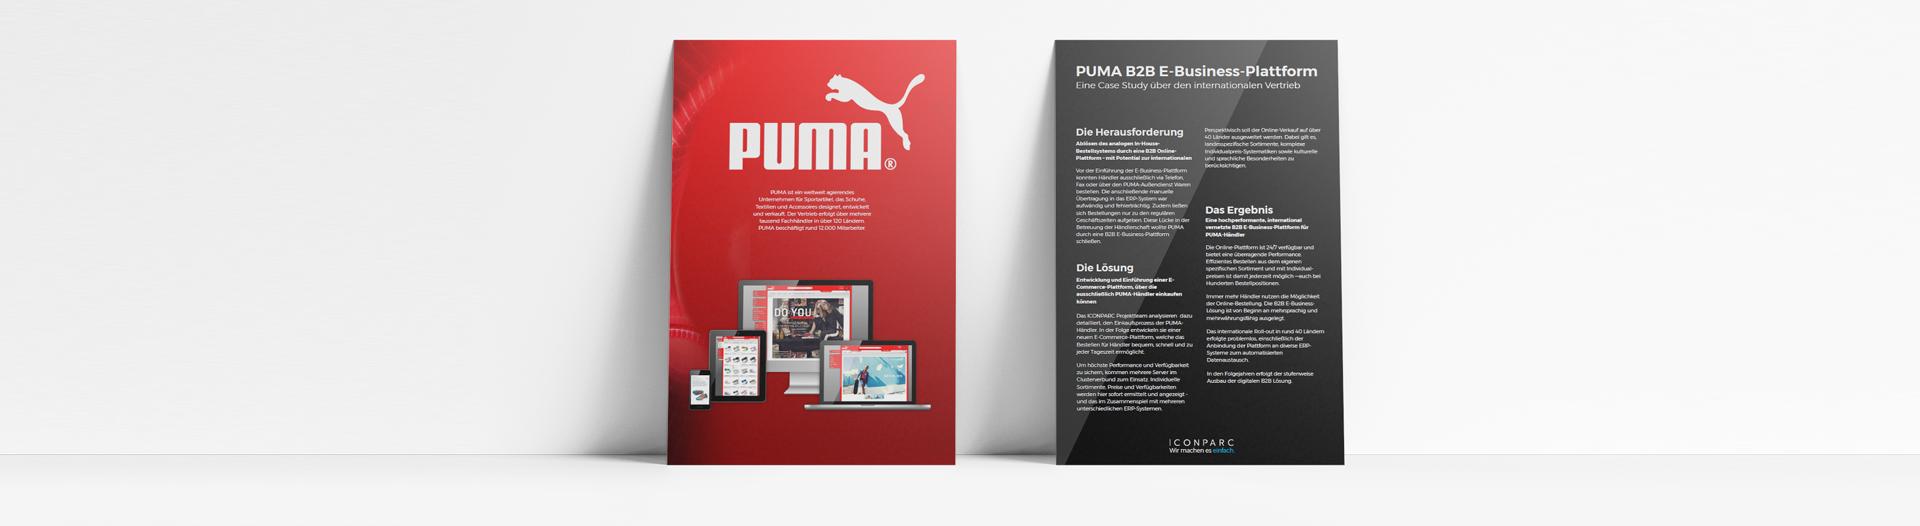 Case Study PUMA B2B E Business by ICONPARC